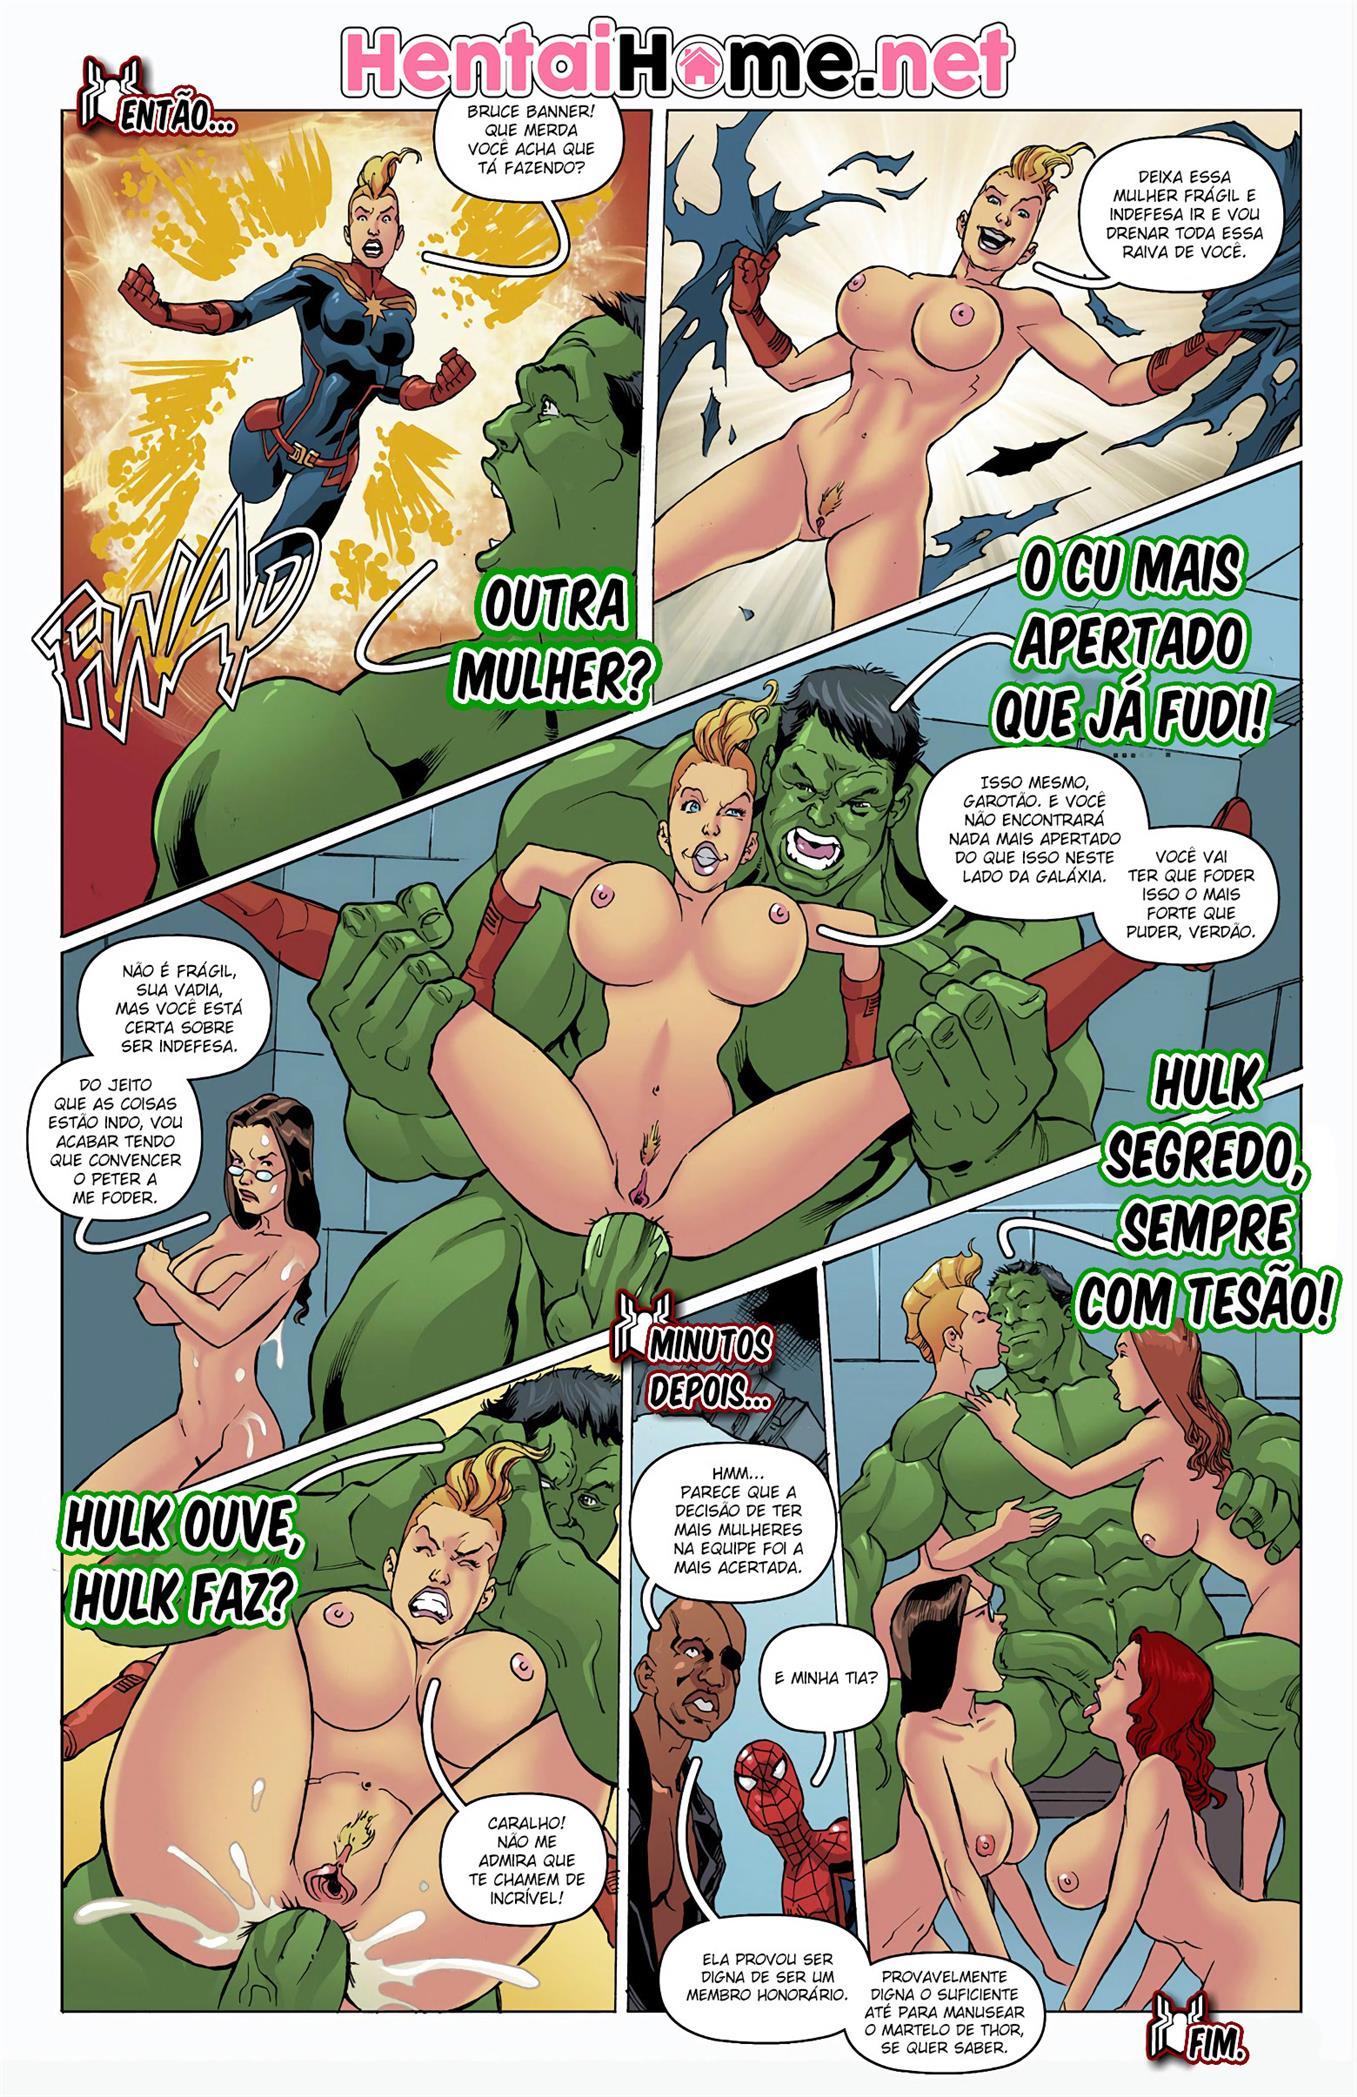 Hulk cheira buceta